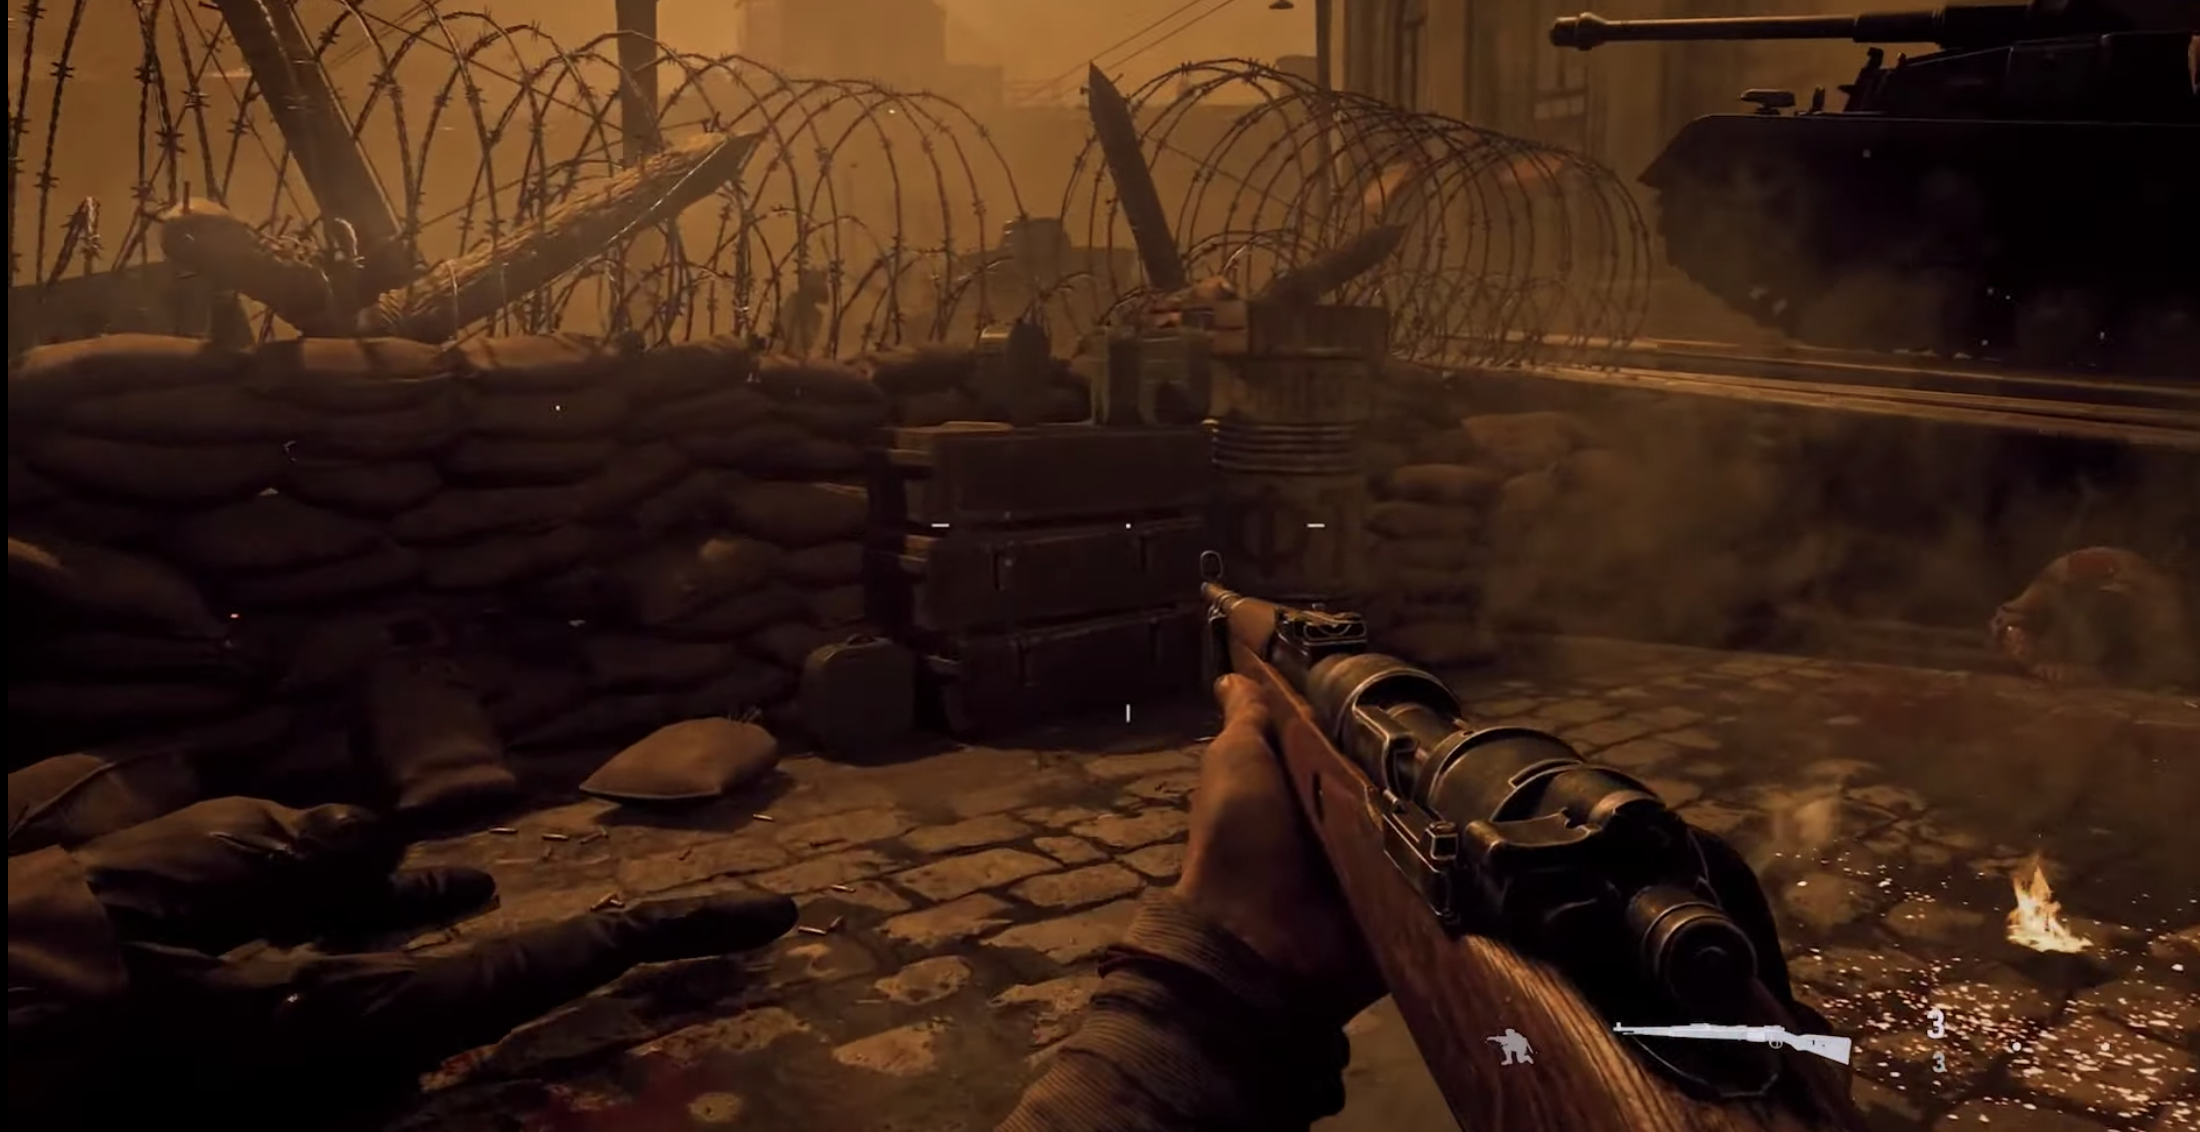 Call Of Duty: Vanguard Campaign Demo Revealed At Gamescom 2021 - GameSpot